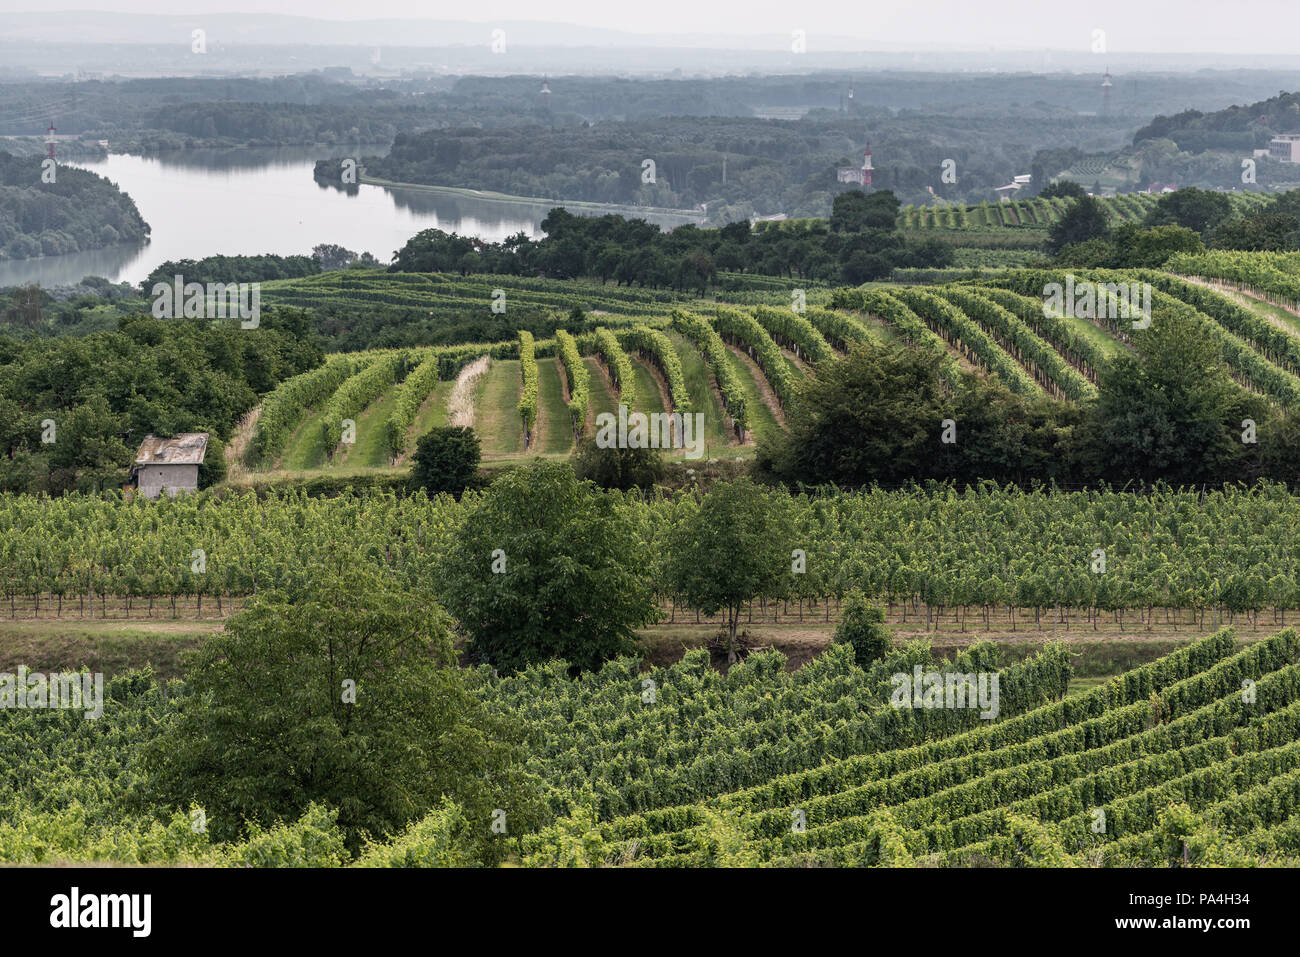 viticulture at Hollenburg, Kremstal, Lower Austria, Austria Stock Photo